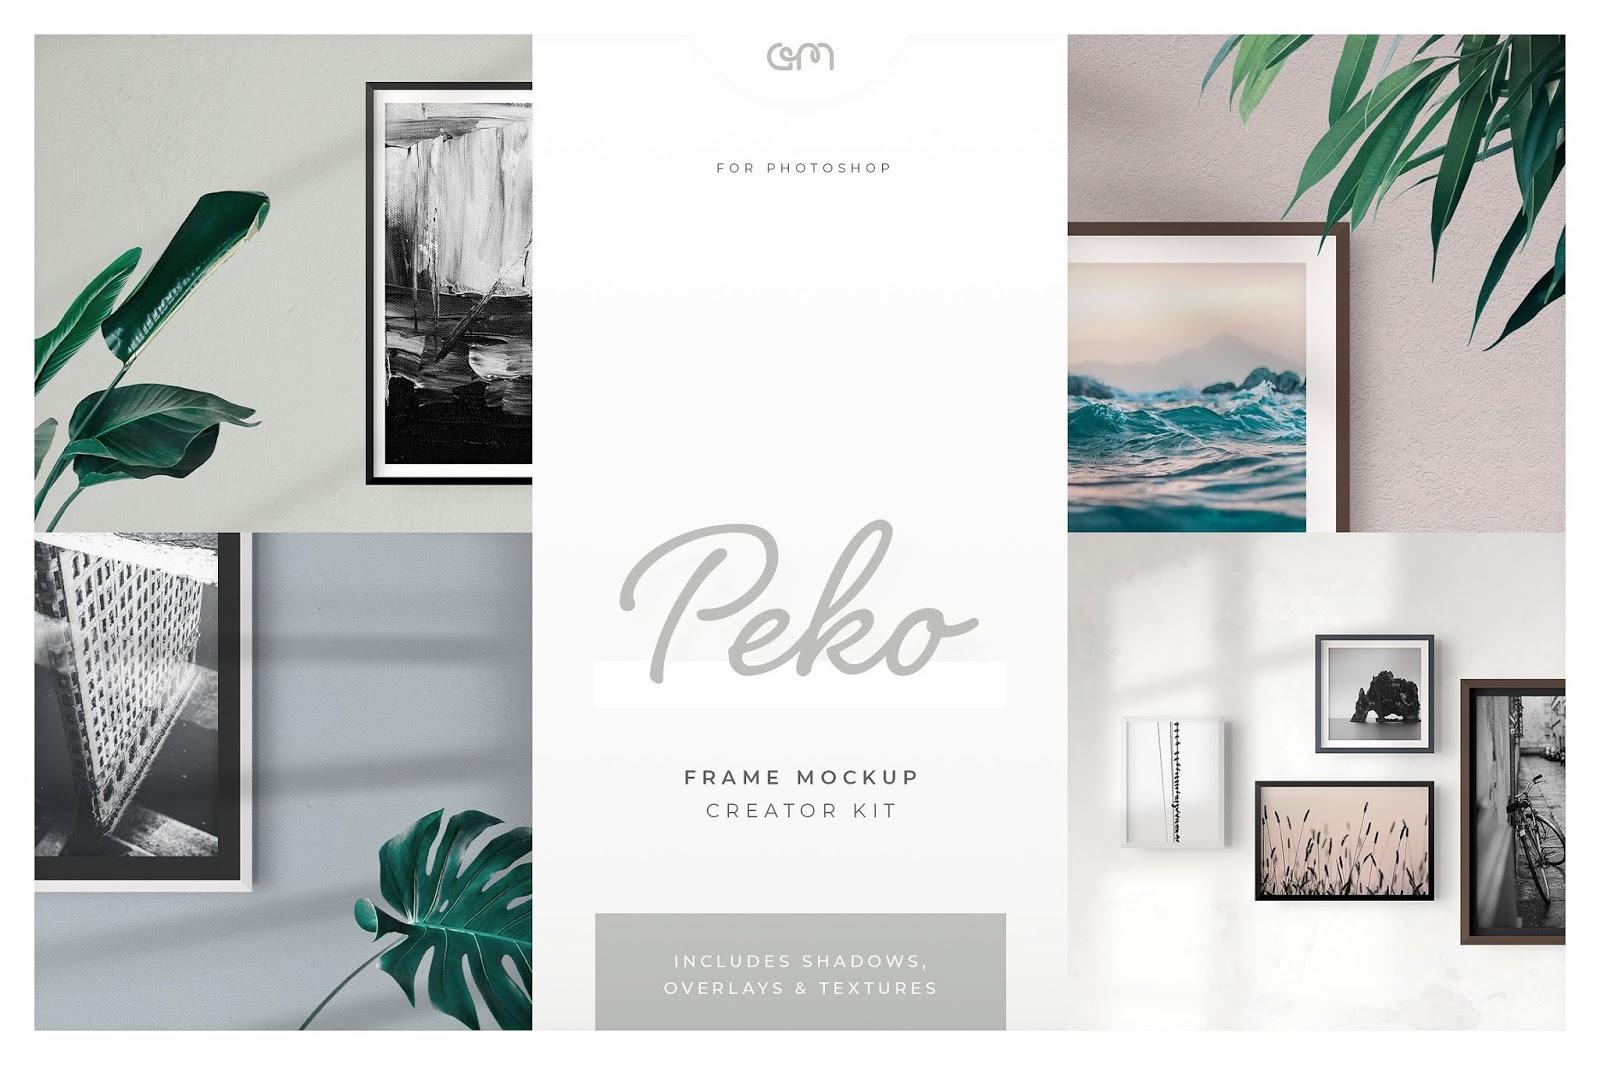 Peko Frame Mockup Creator Kit